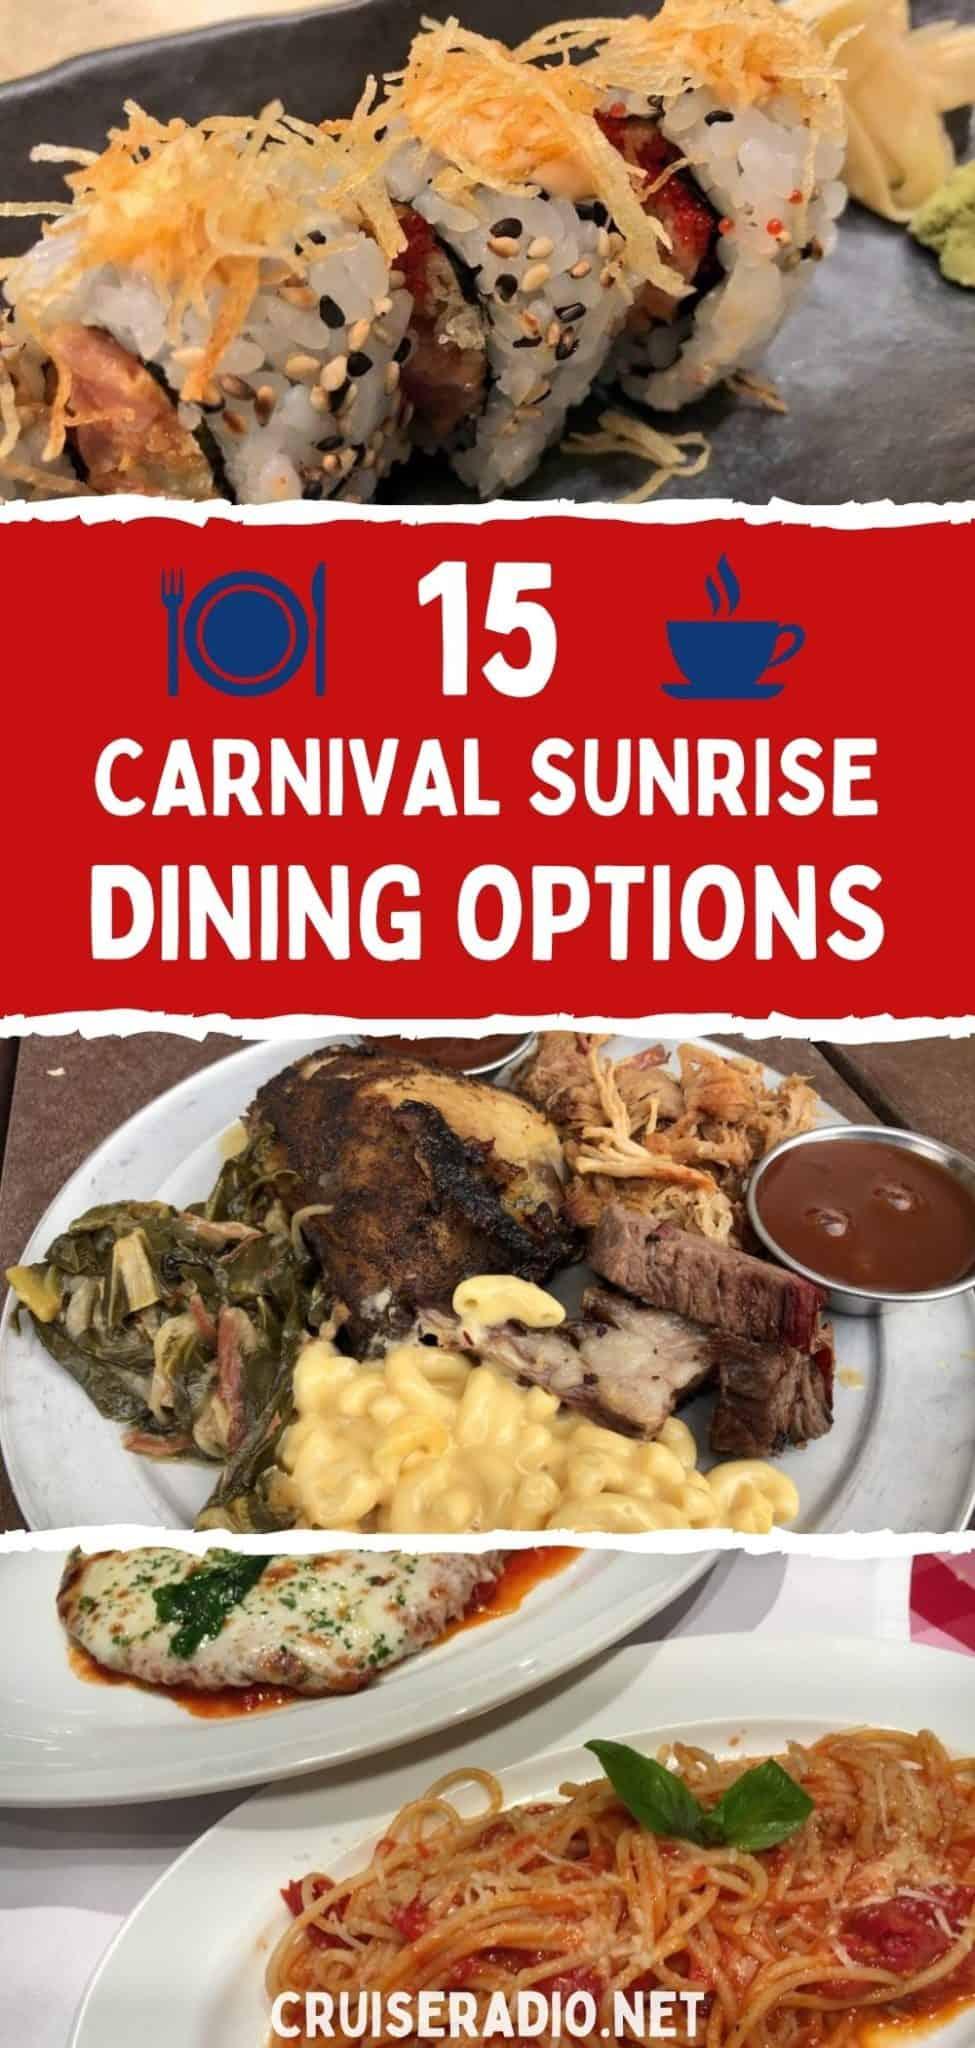 15 carnival sunrise dining options